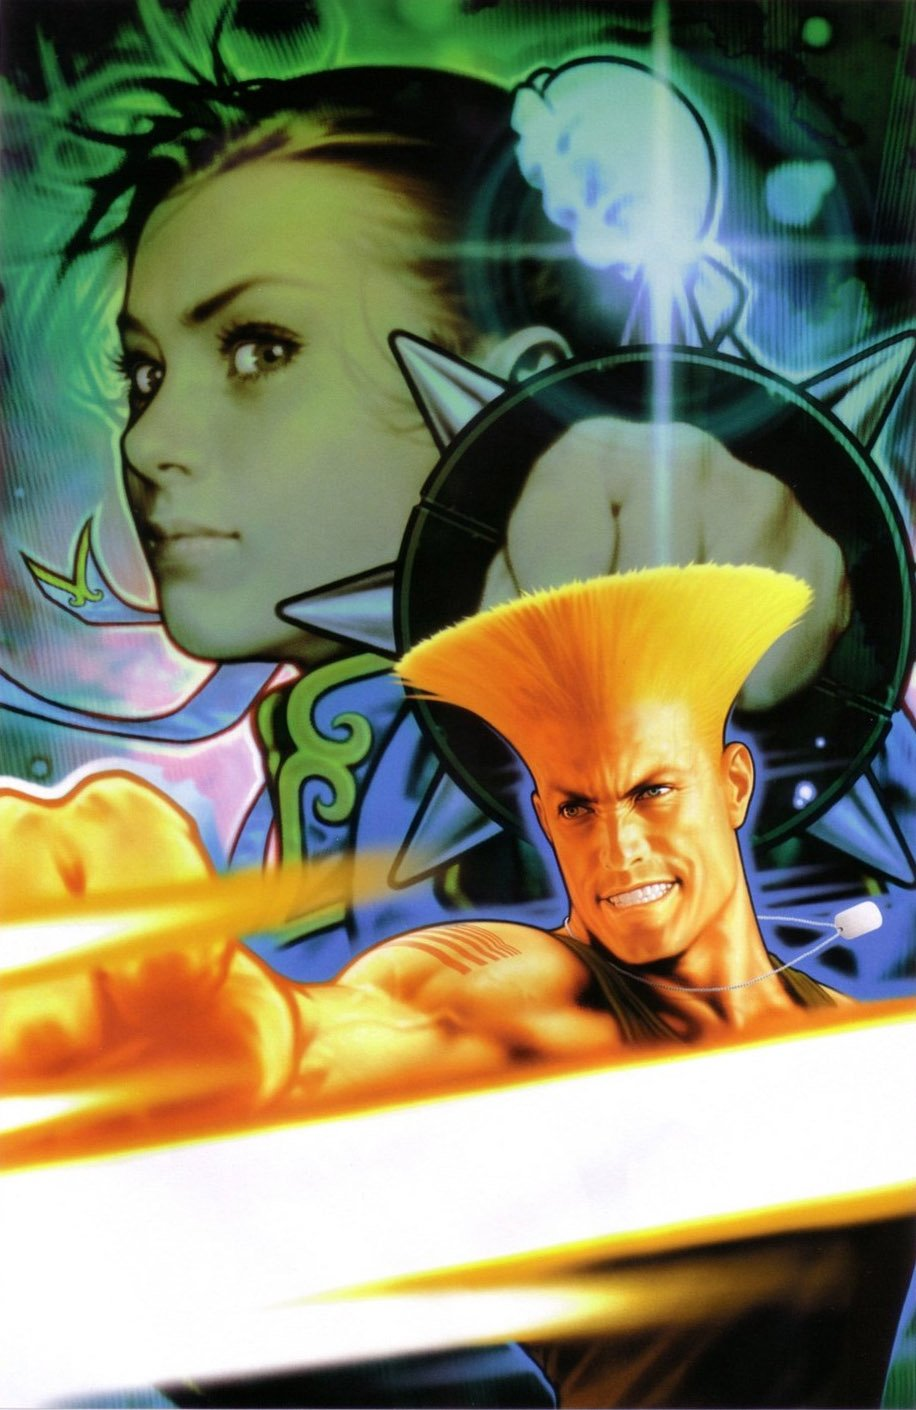 Street Fighter Vol.1 005 (January 2004) (Shinkiro Power Cell variant)